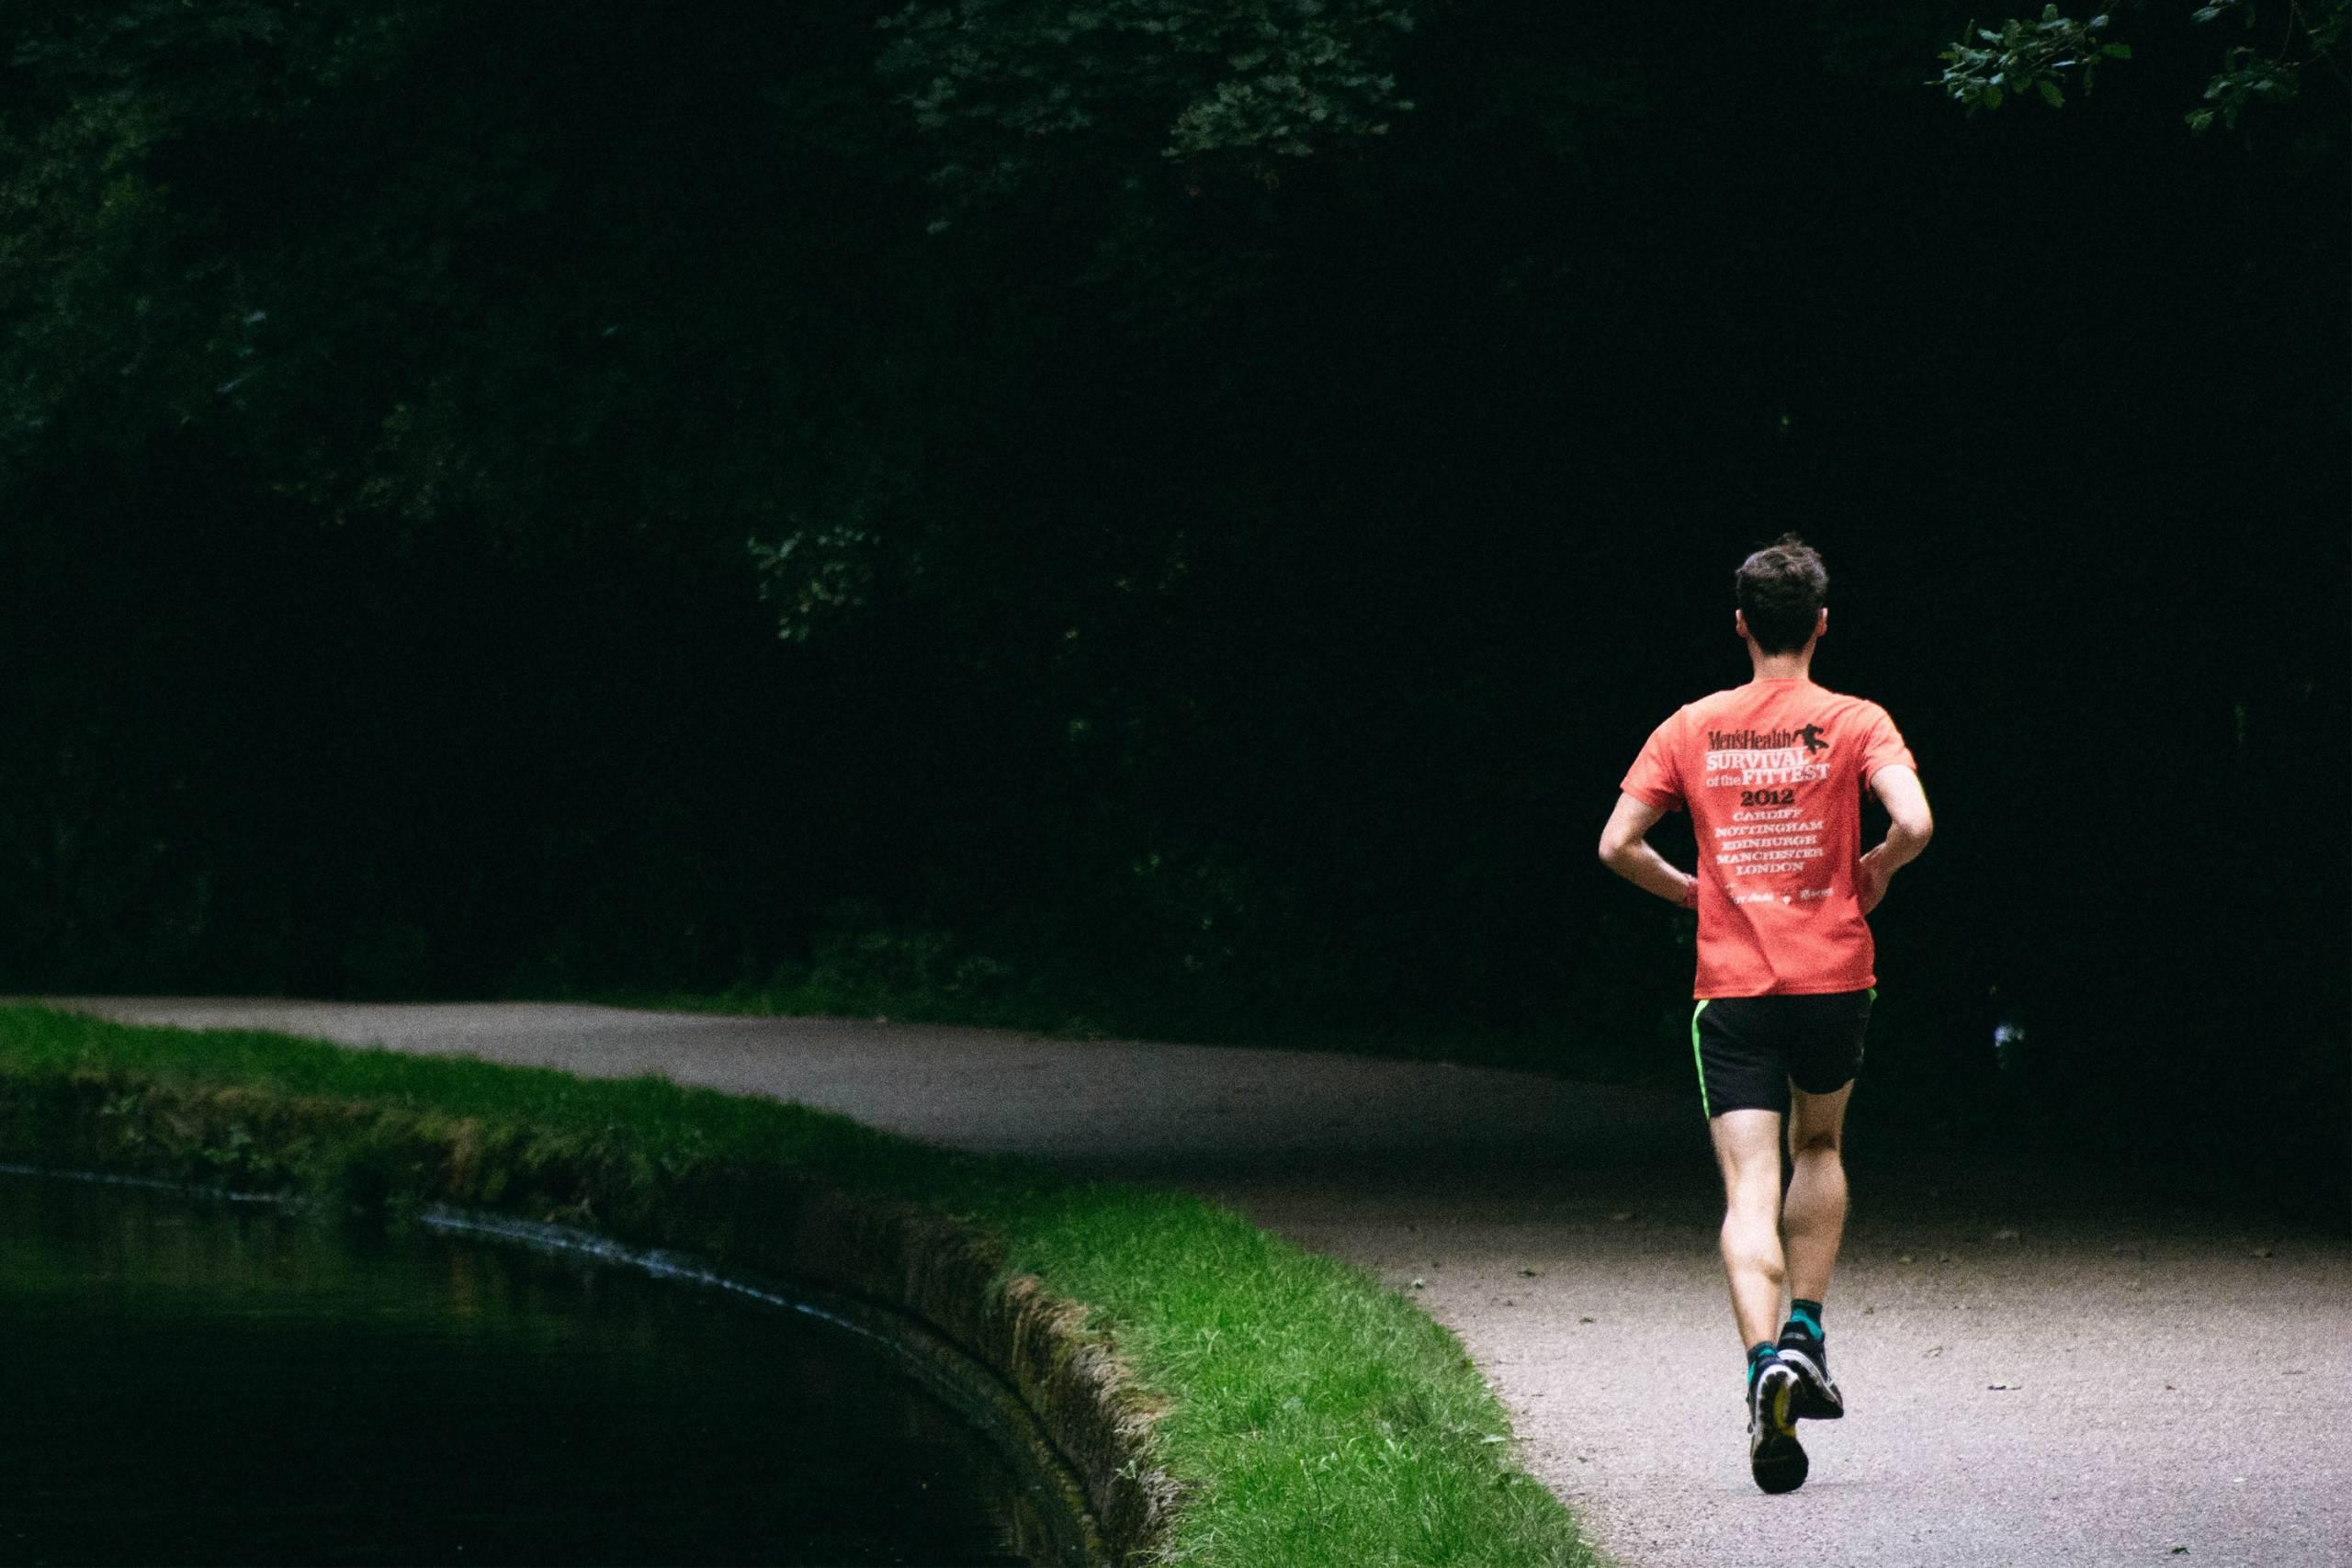 man running along gravel trail wearing red t-shirt